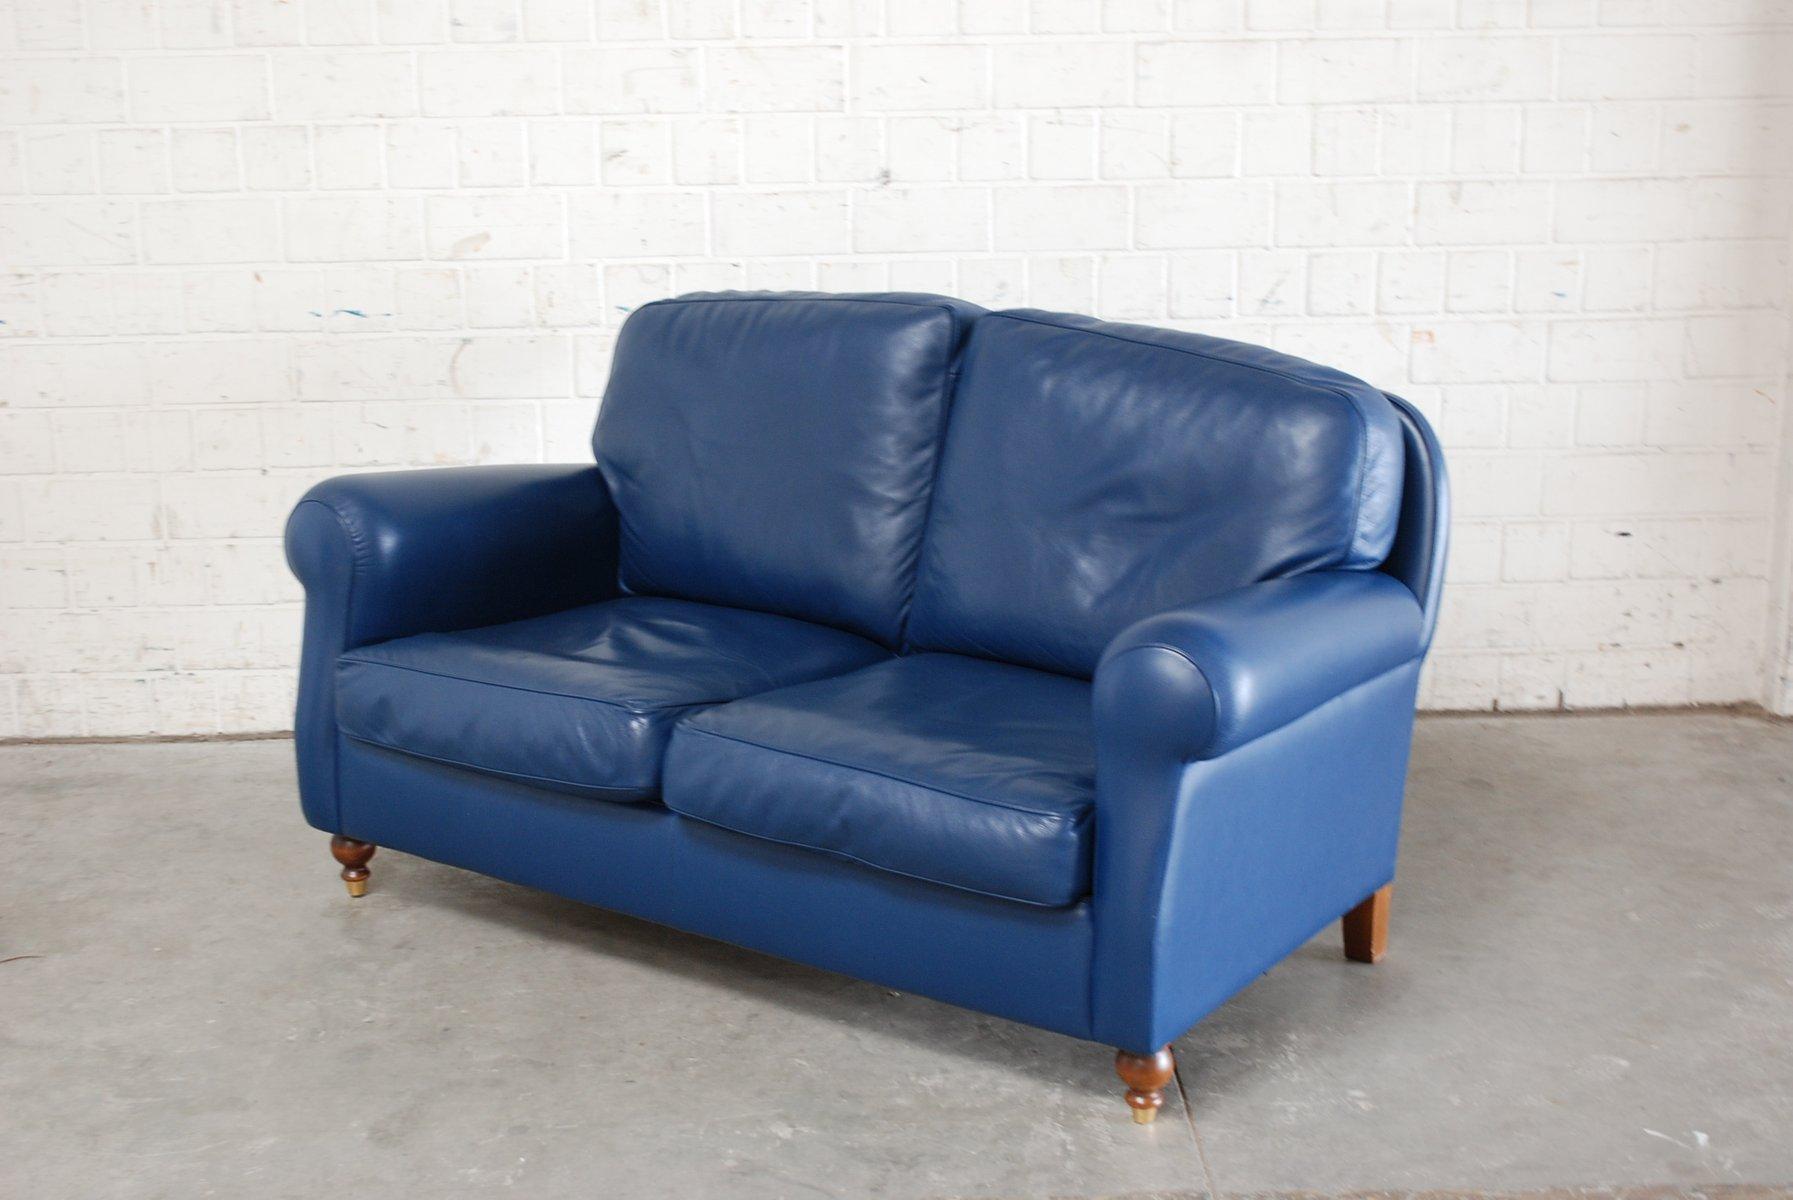 blaues george sofa aus leder von poltrona frau 1999 bei pamono kaufen. Black Bedroom Furniture Sets. Home Design Ideas